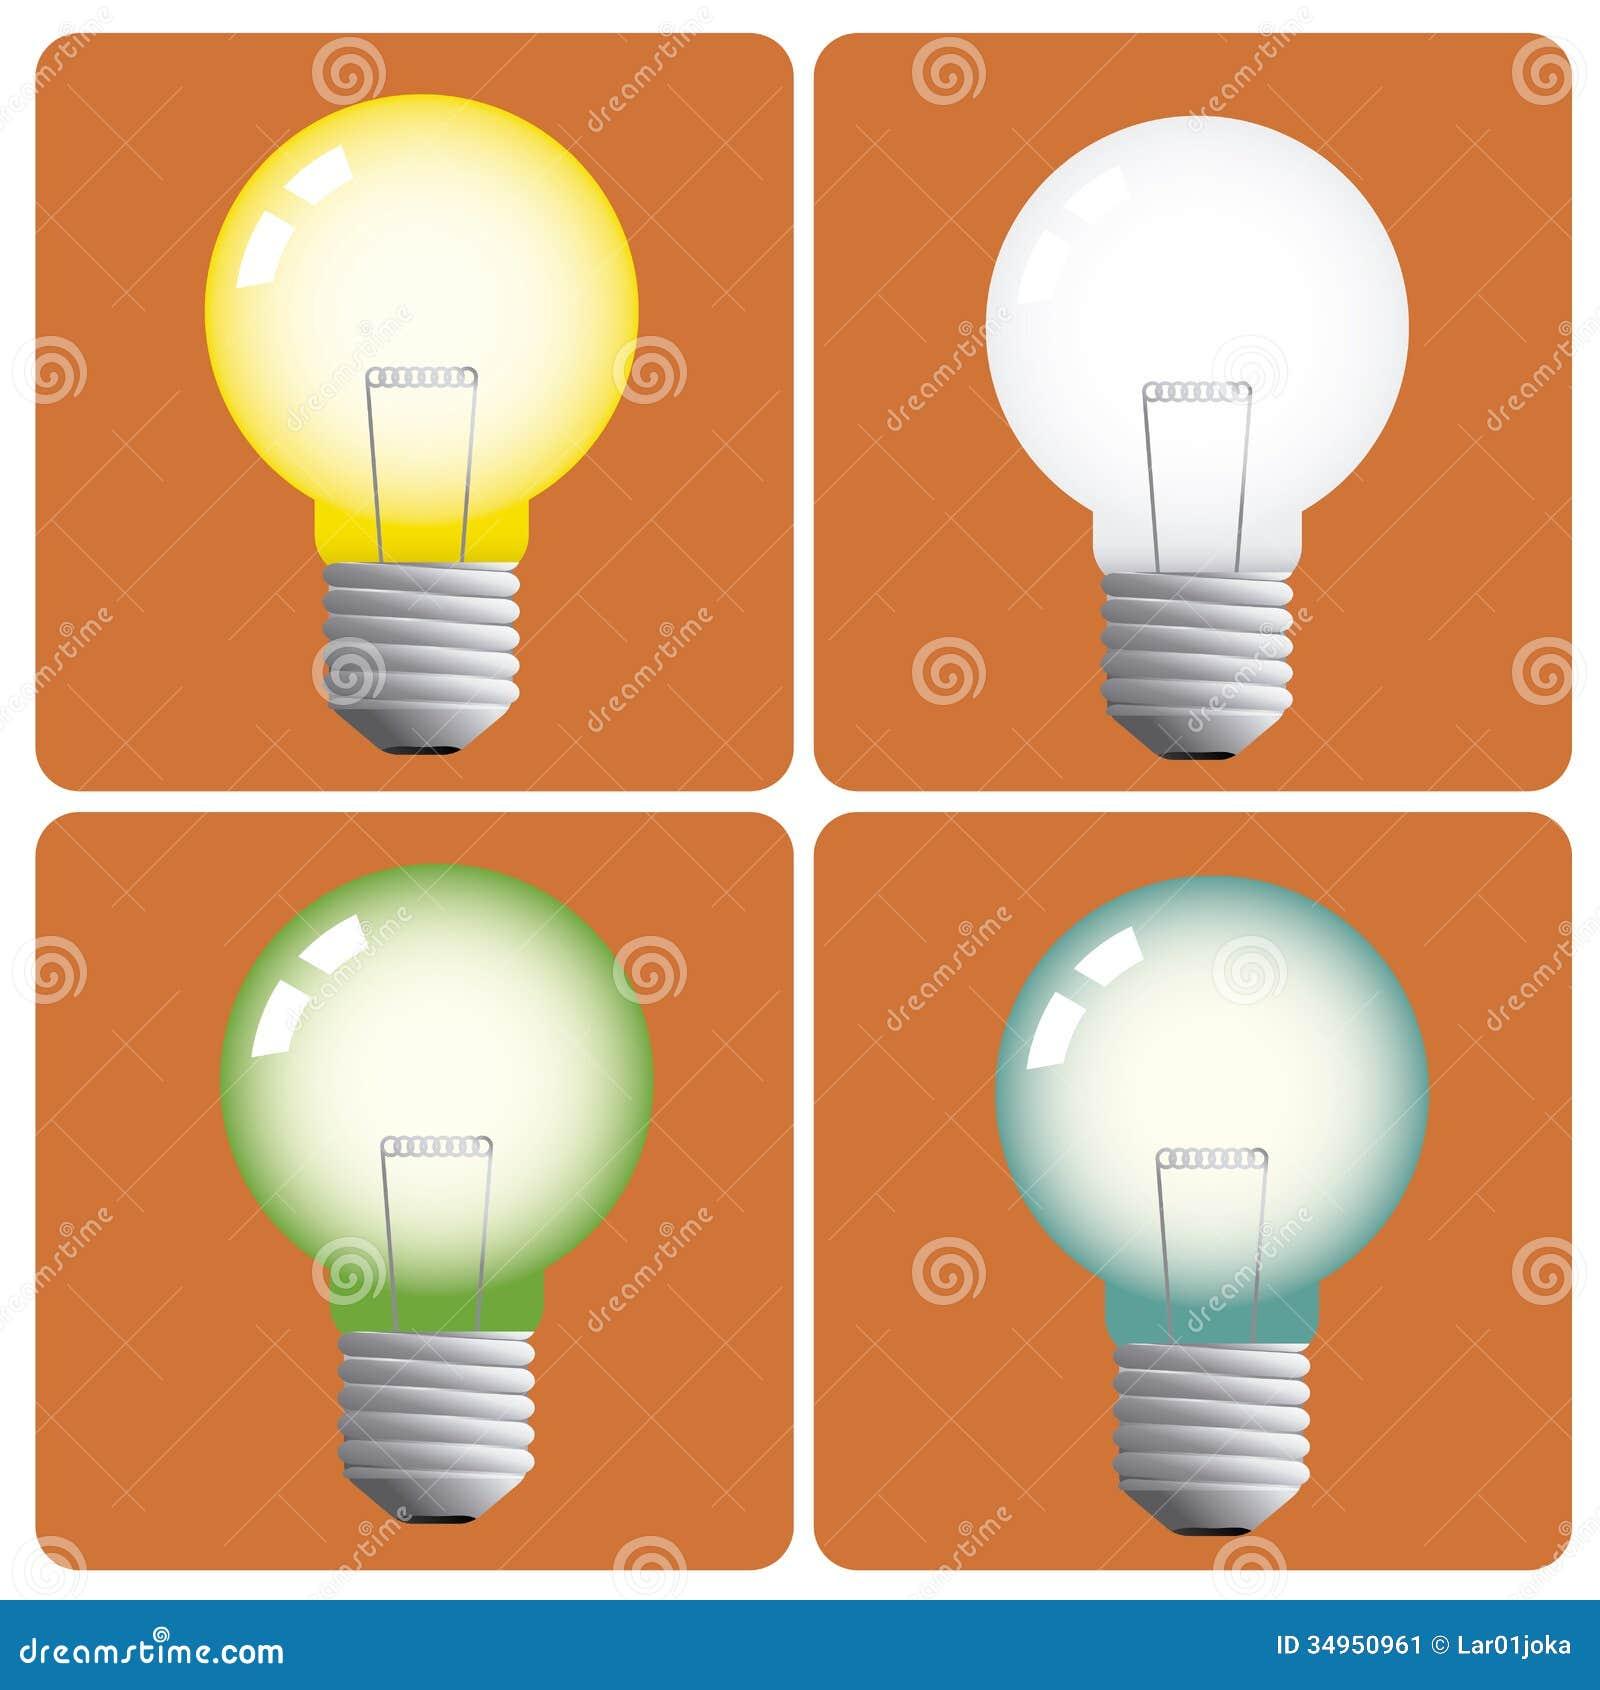 lightbulbs stock vector illustration of green drawing 34950961. Black Bedroom Furniture Sets. Home Design Ideas